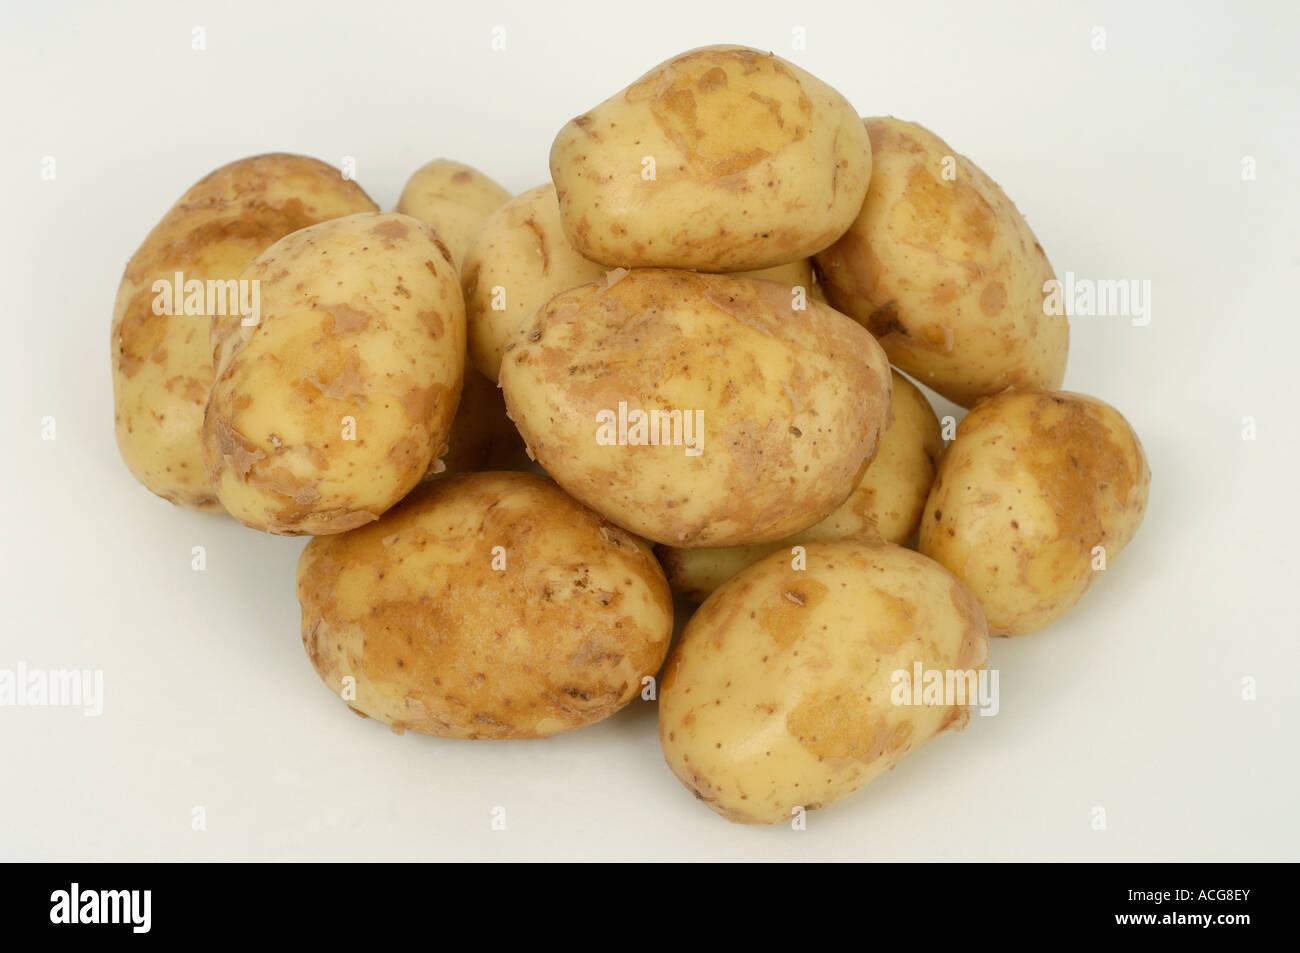 Jersey Royal potatoes ex supermarket shop bought tubers Stock Photo